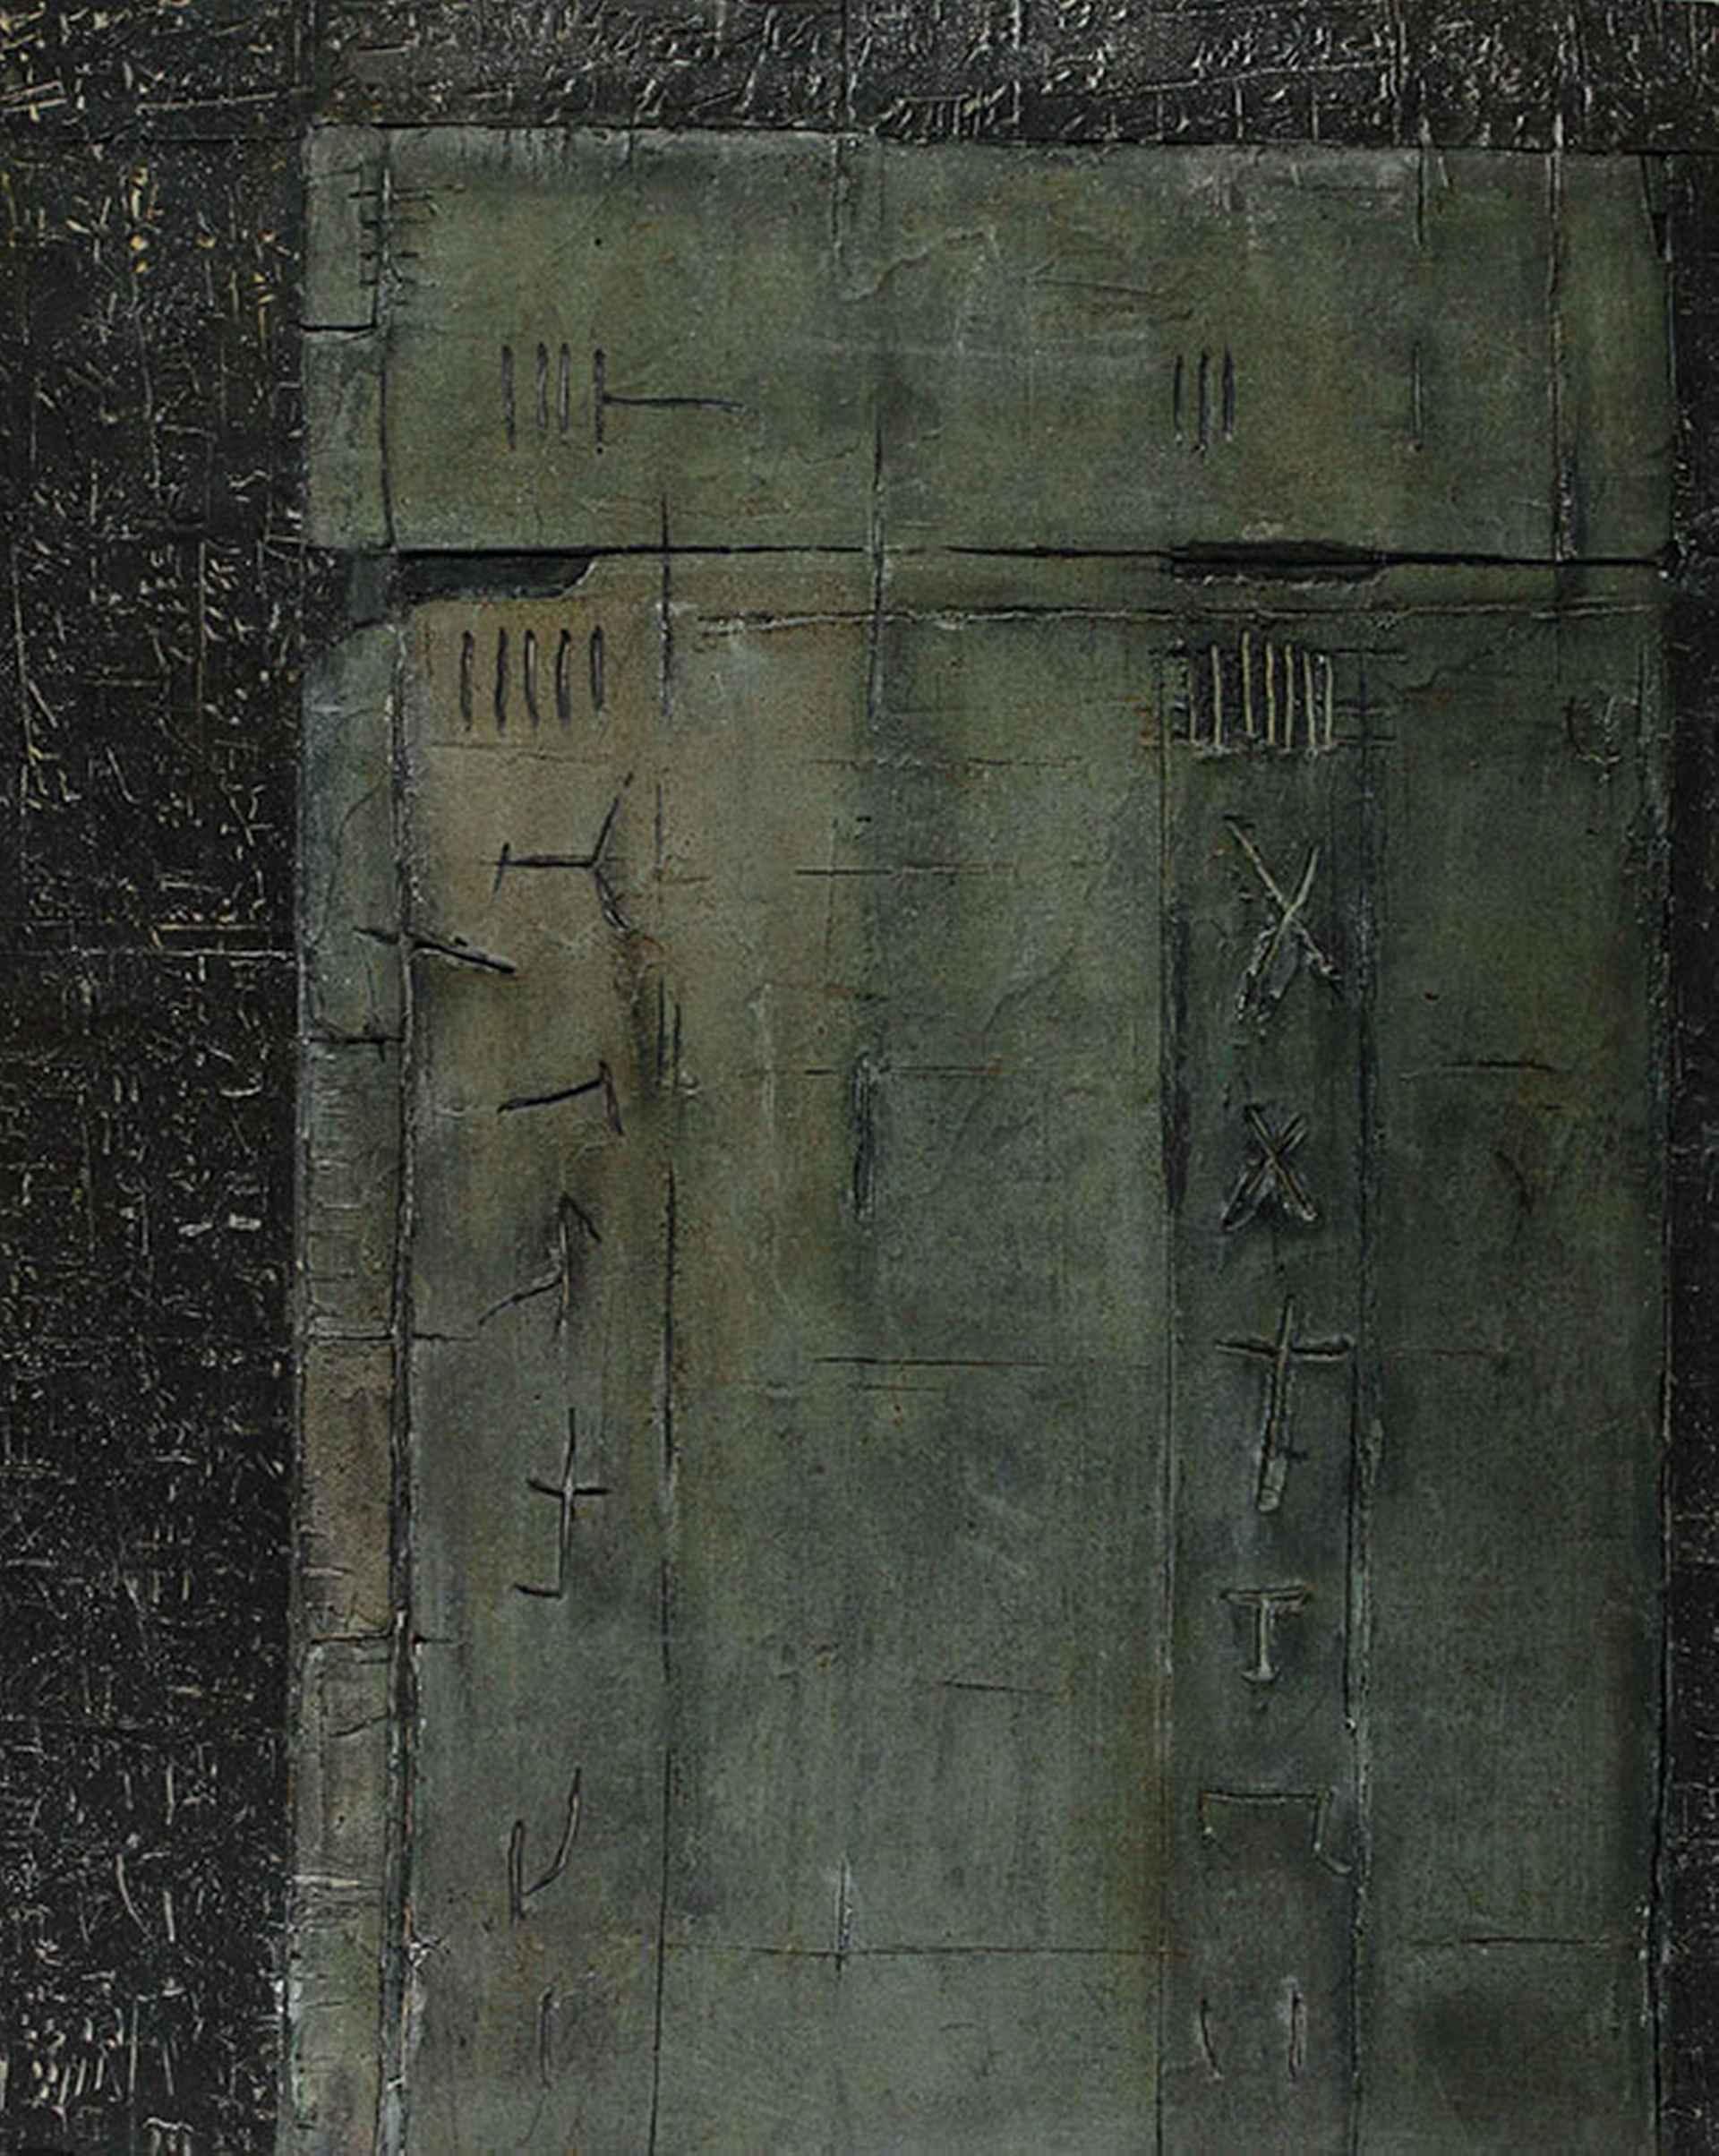 Tower by James Cummins